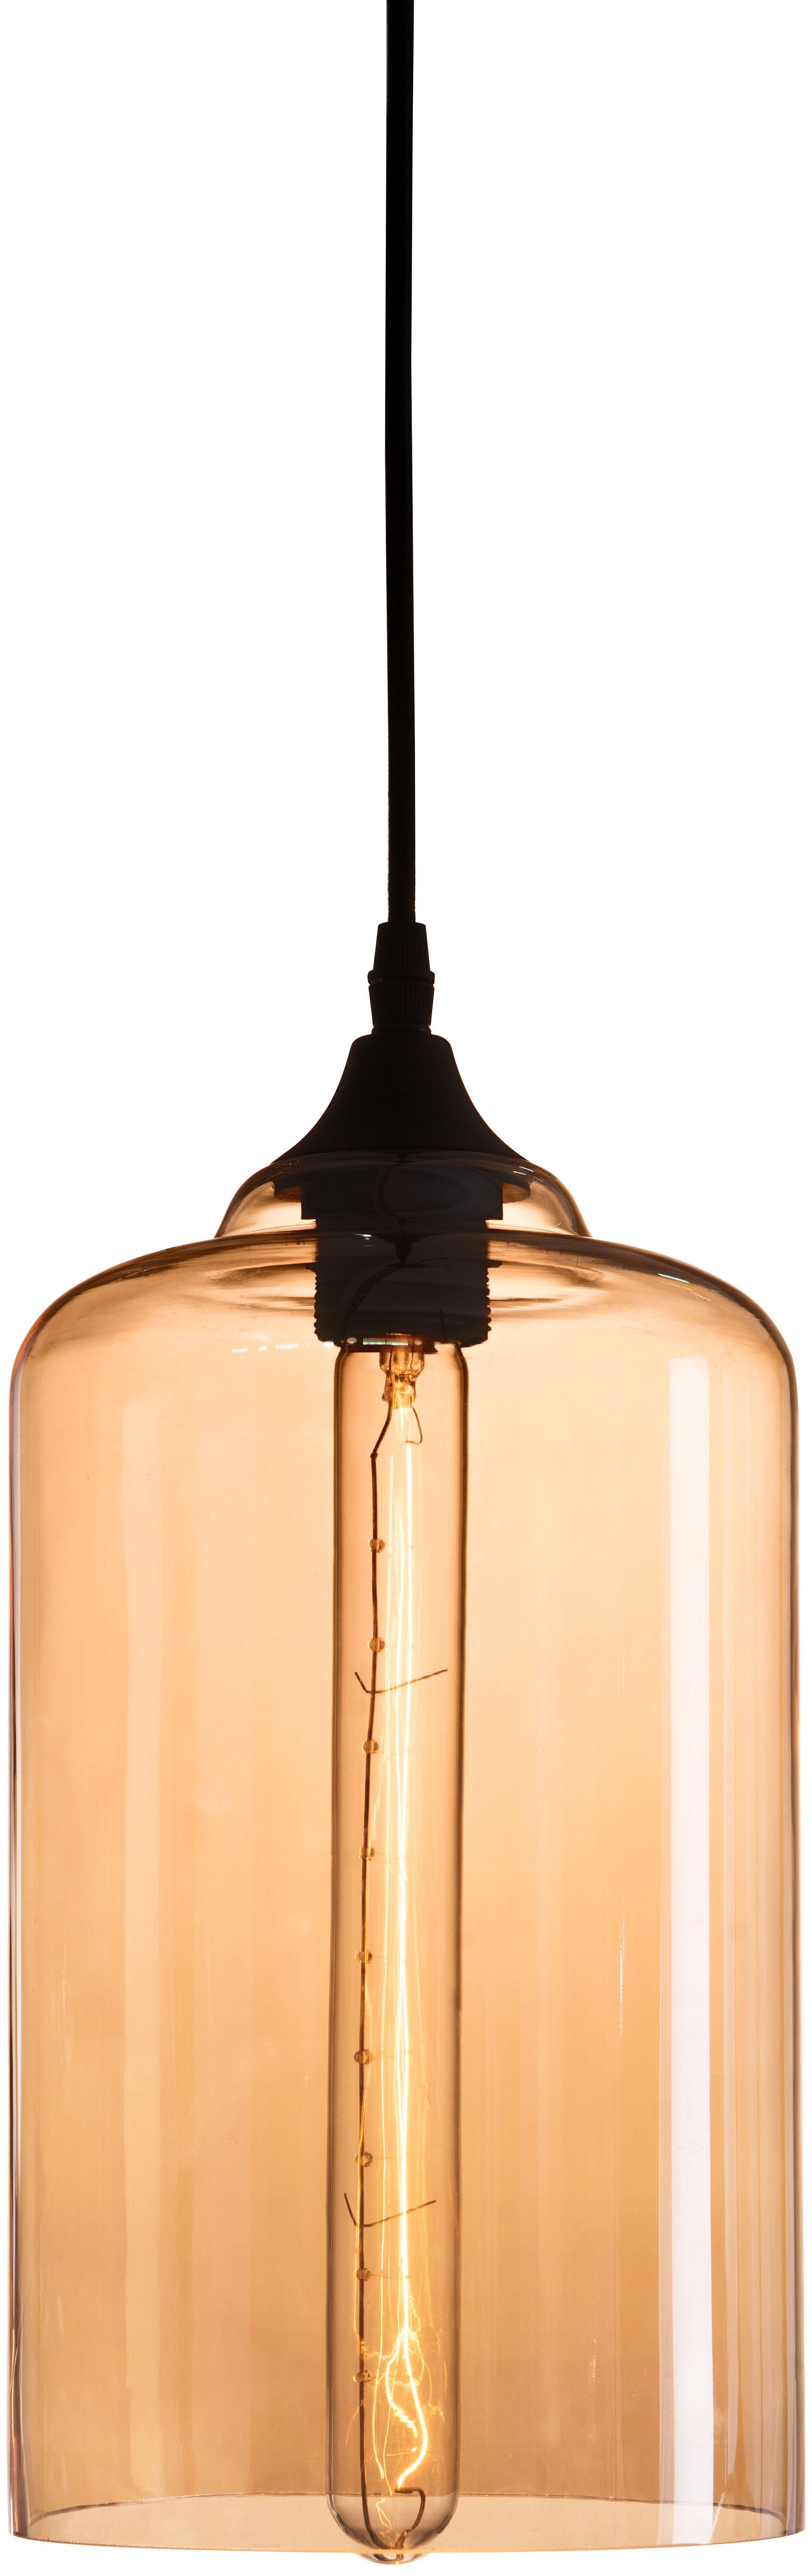 Bismite Ceiling Lamp zuo 98258